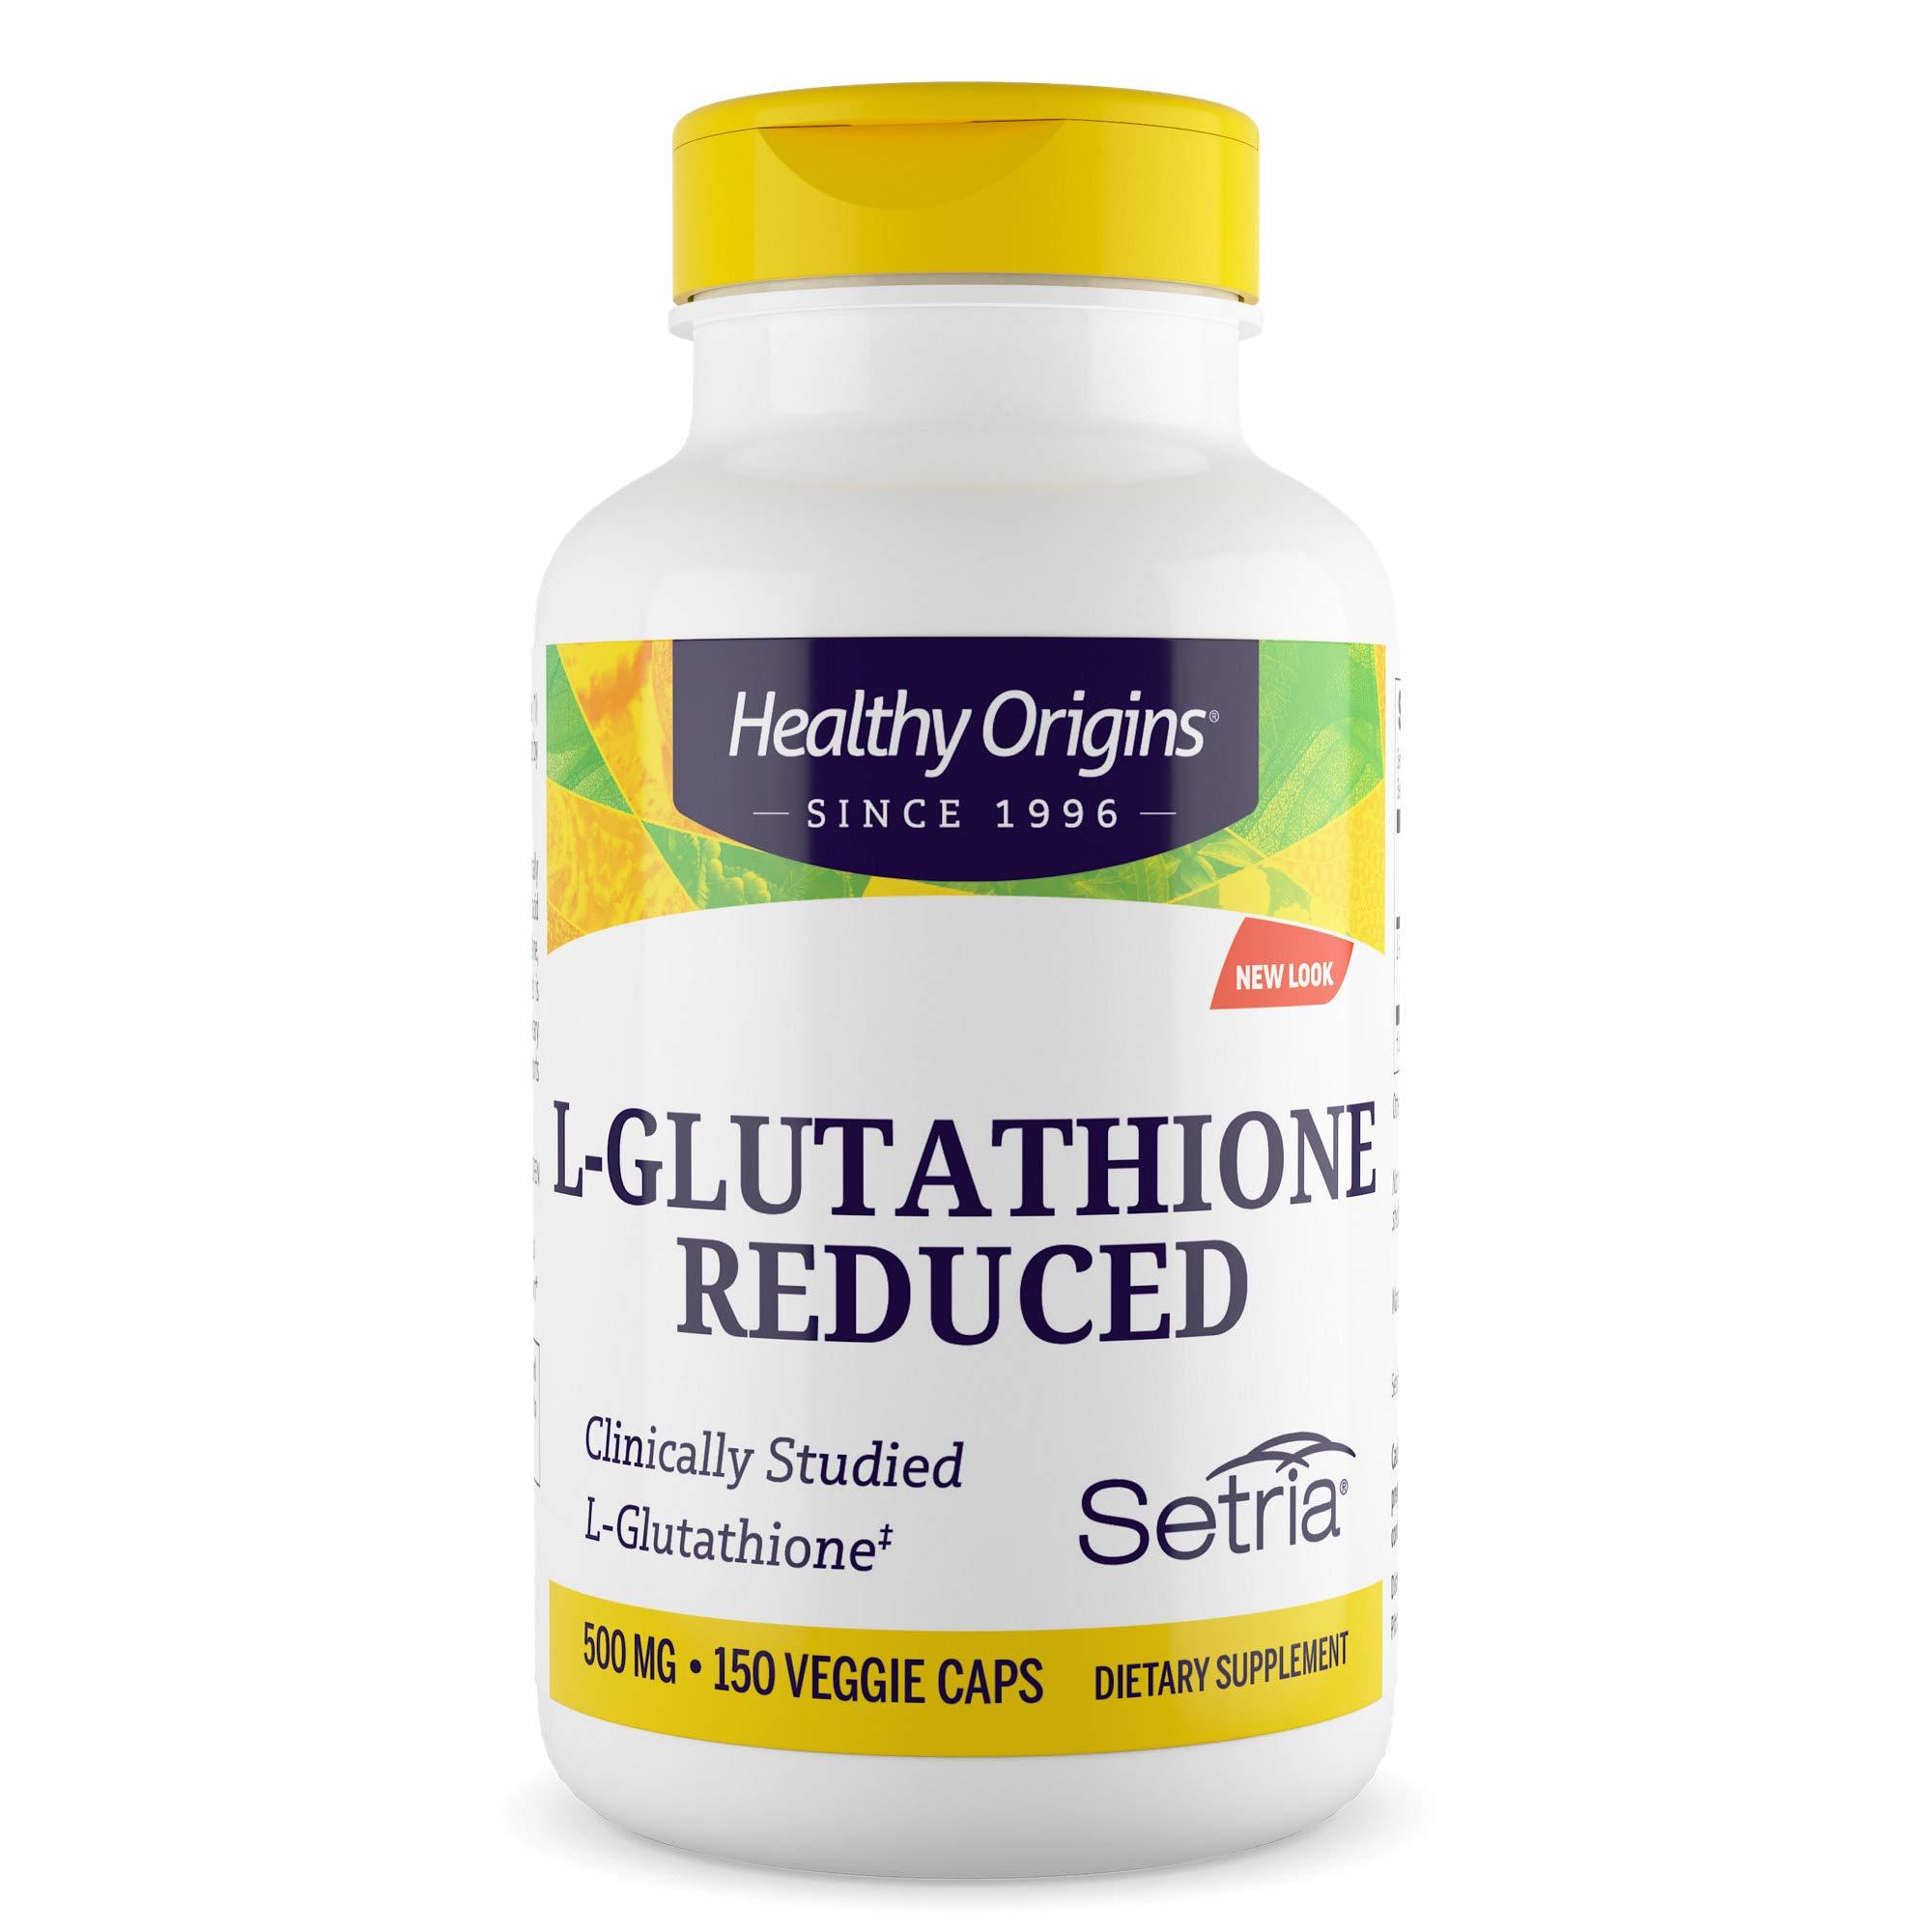 Healthy Origins L-Glutathione (Setria) 500 mg, 150 Veggie Caps